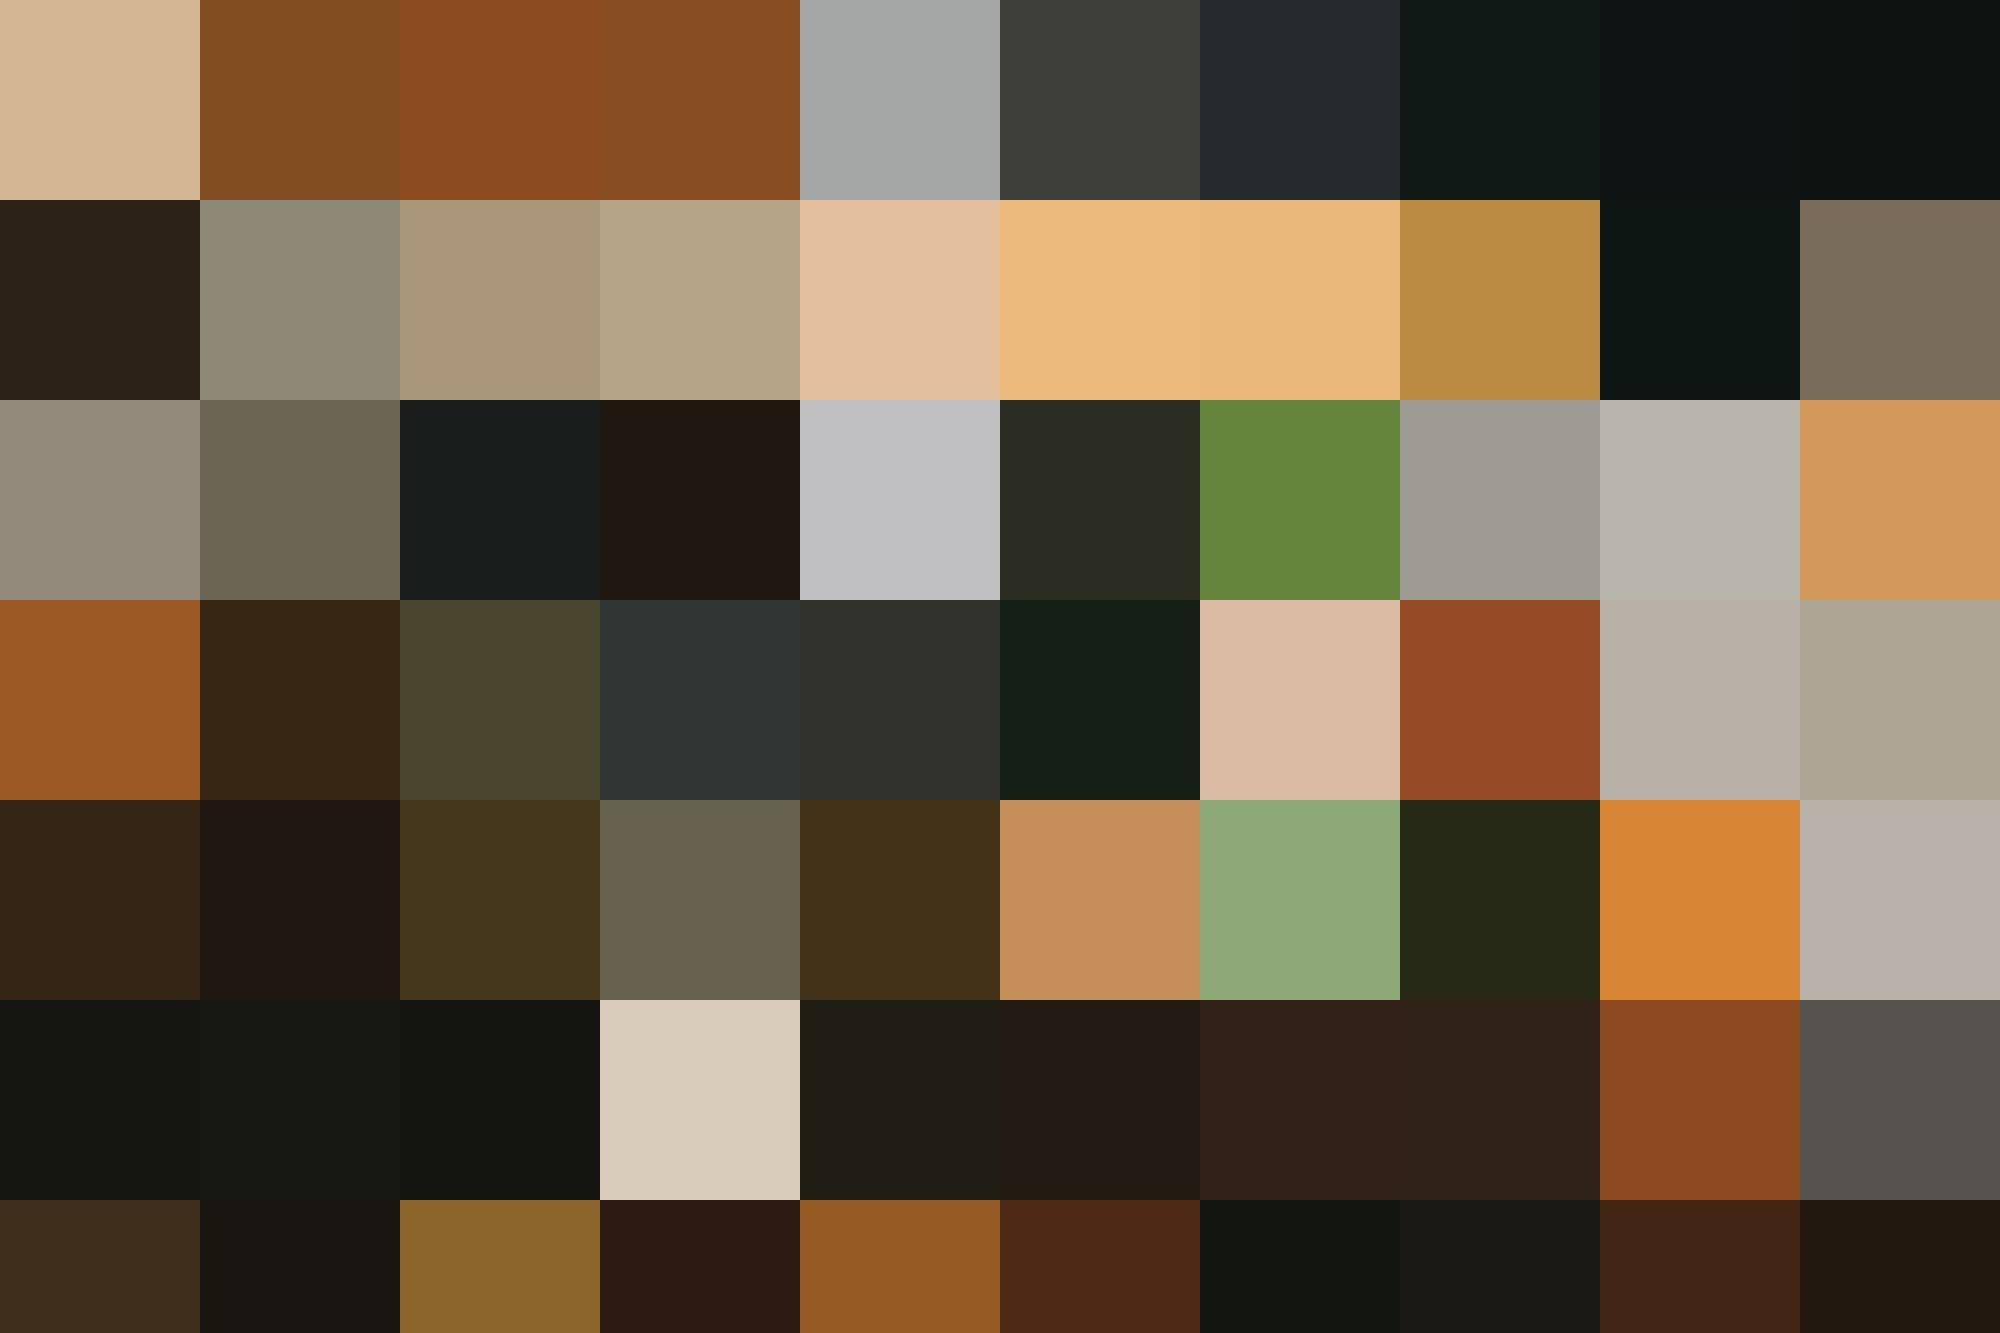 HAL Landscape 2500x1666 3